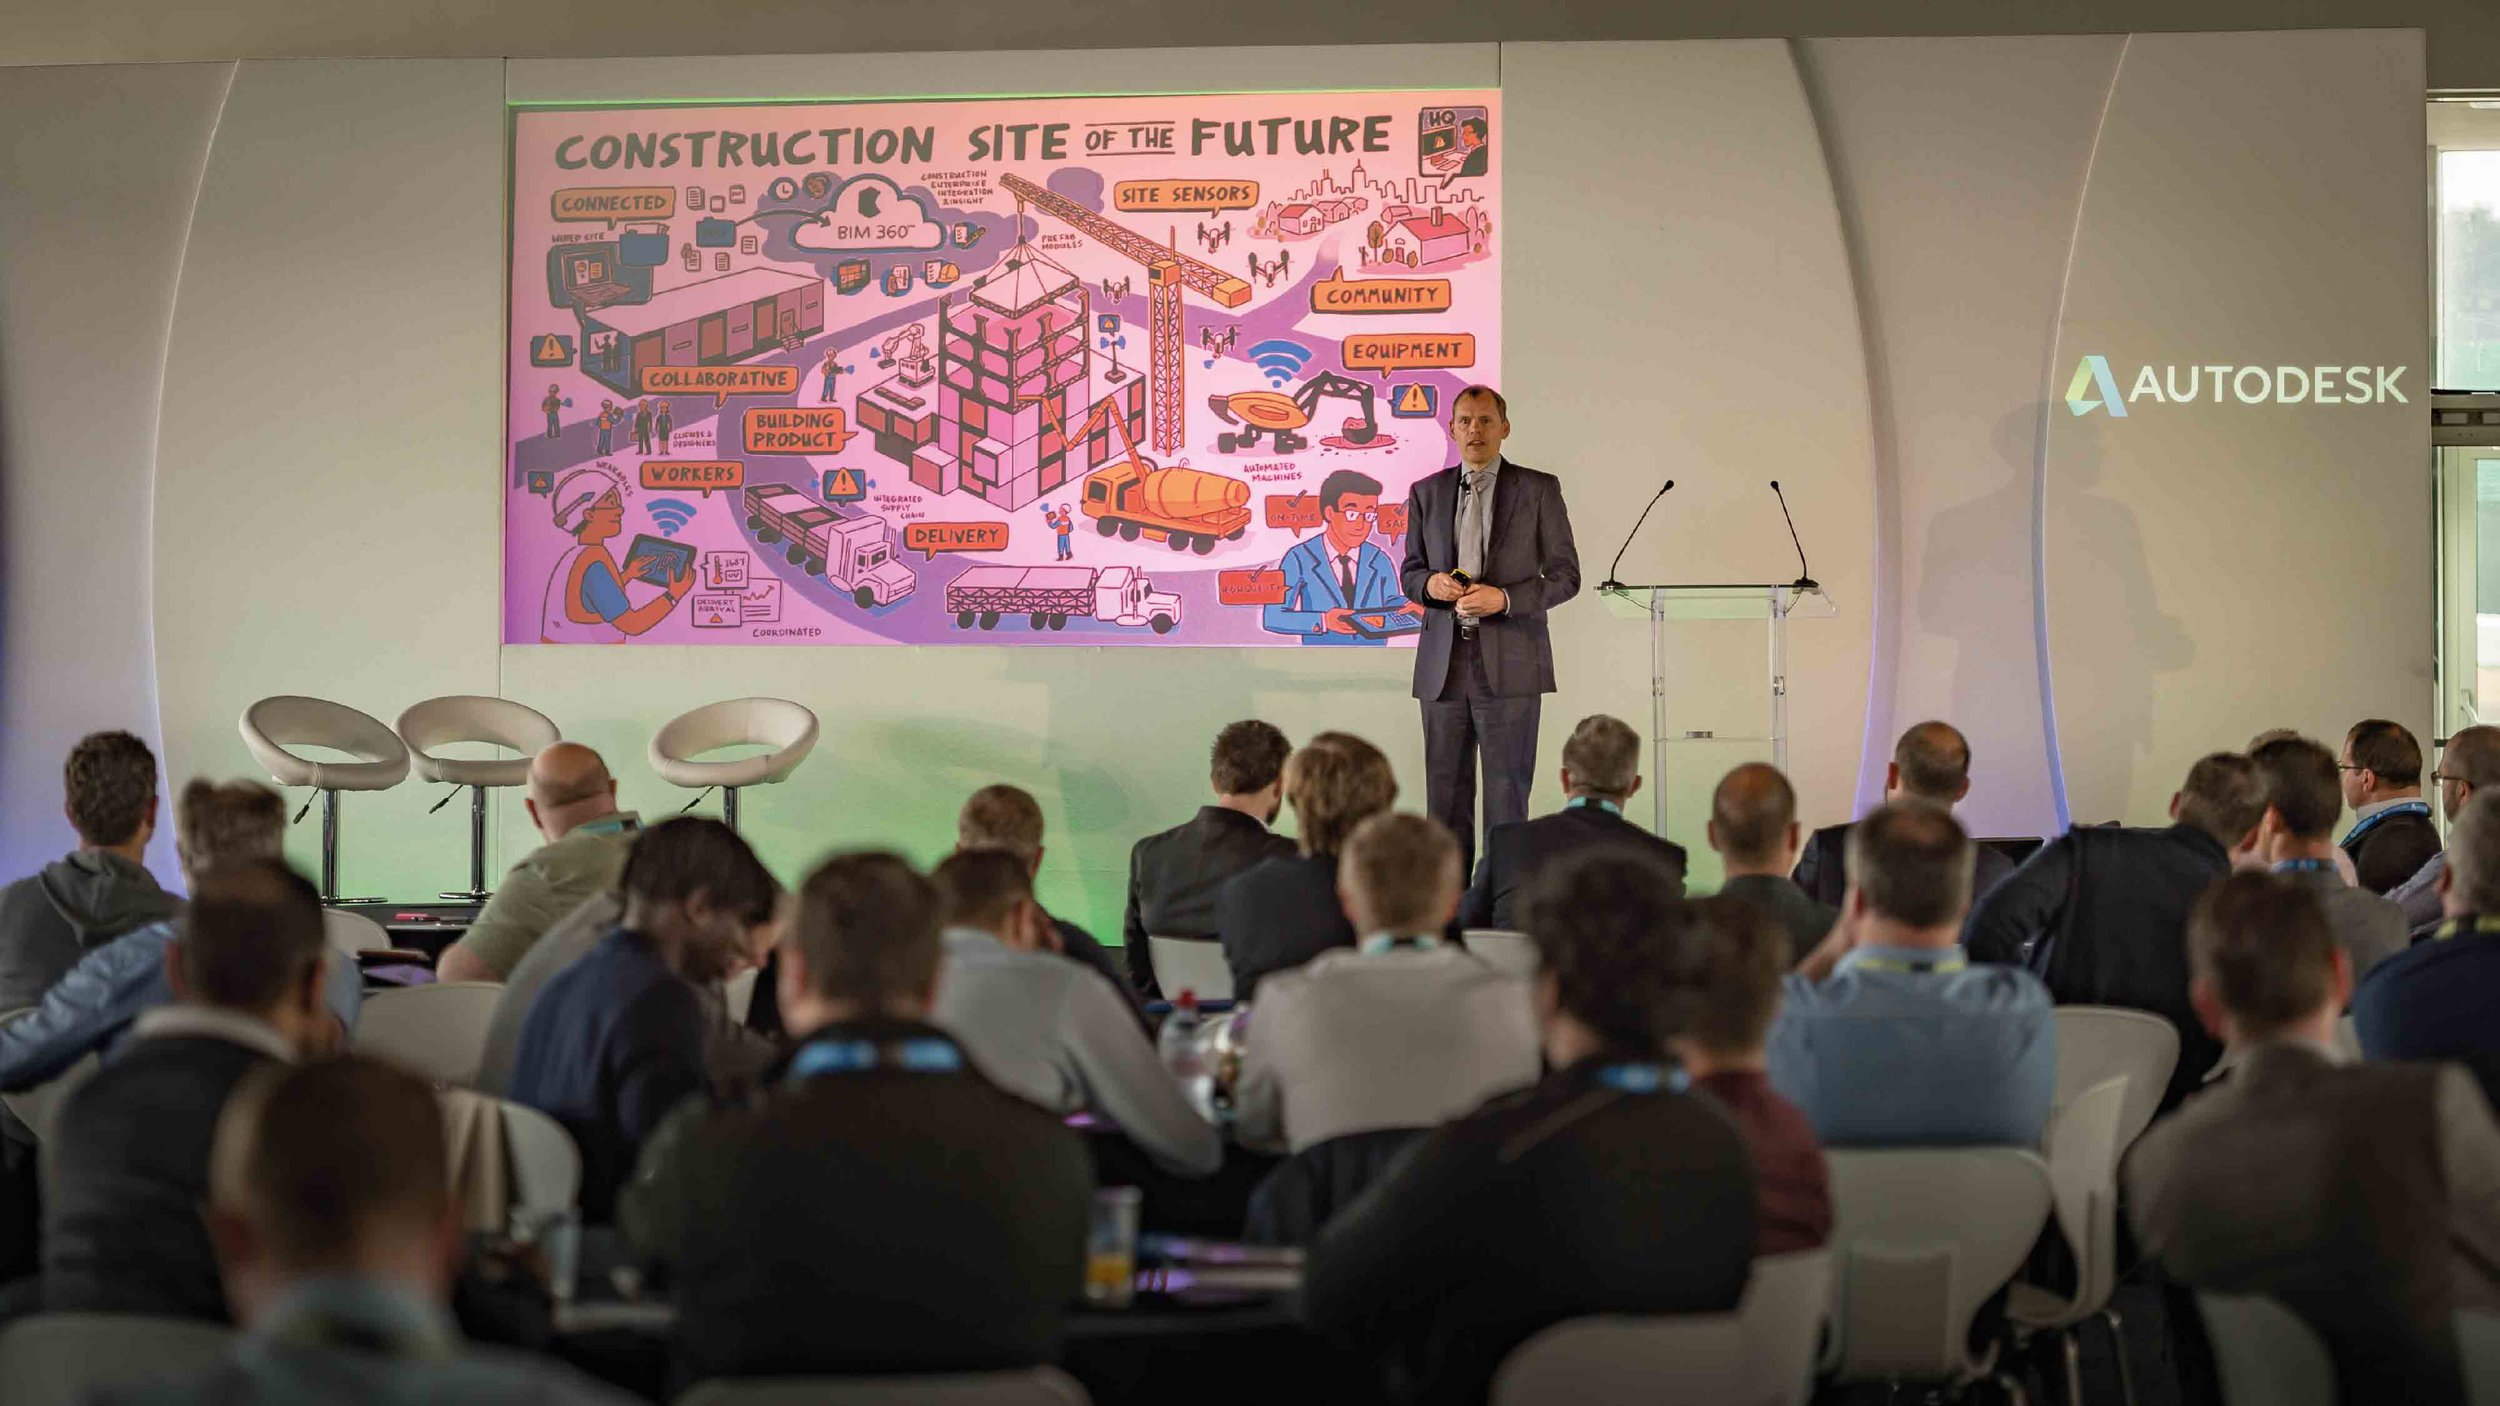 Autodesk Construction Event UK 2016-01.jpg